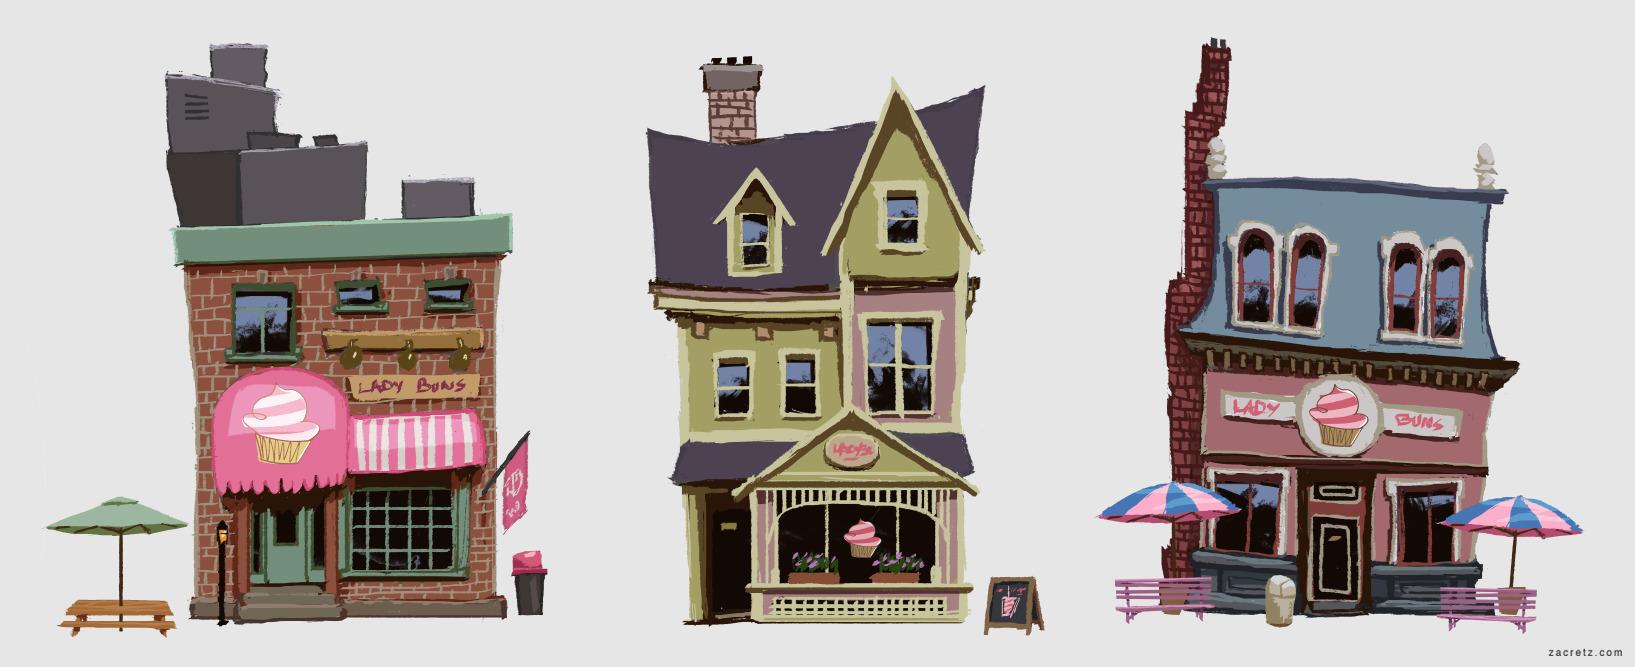 bakery shop designs - chadzacfilm - zacretz   ello